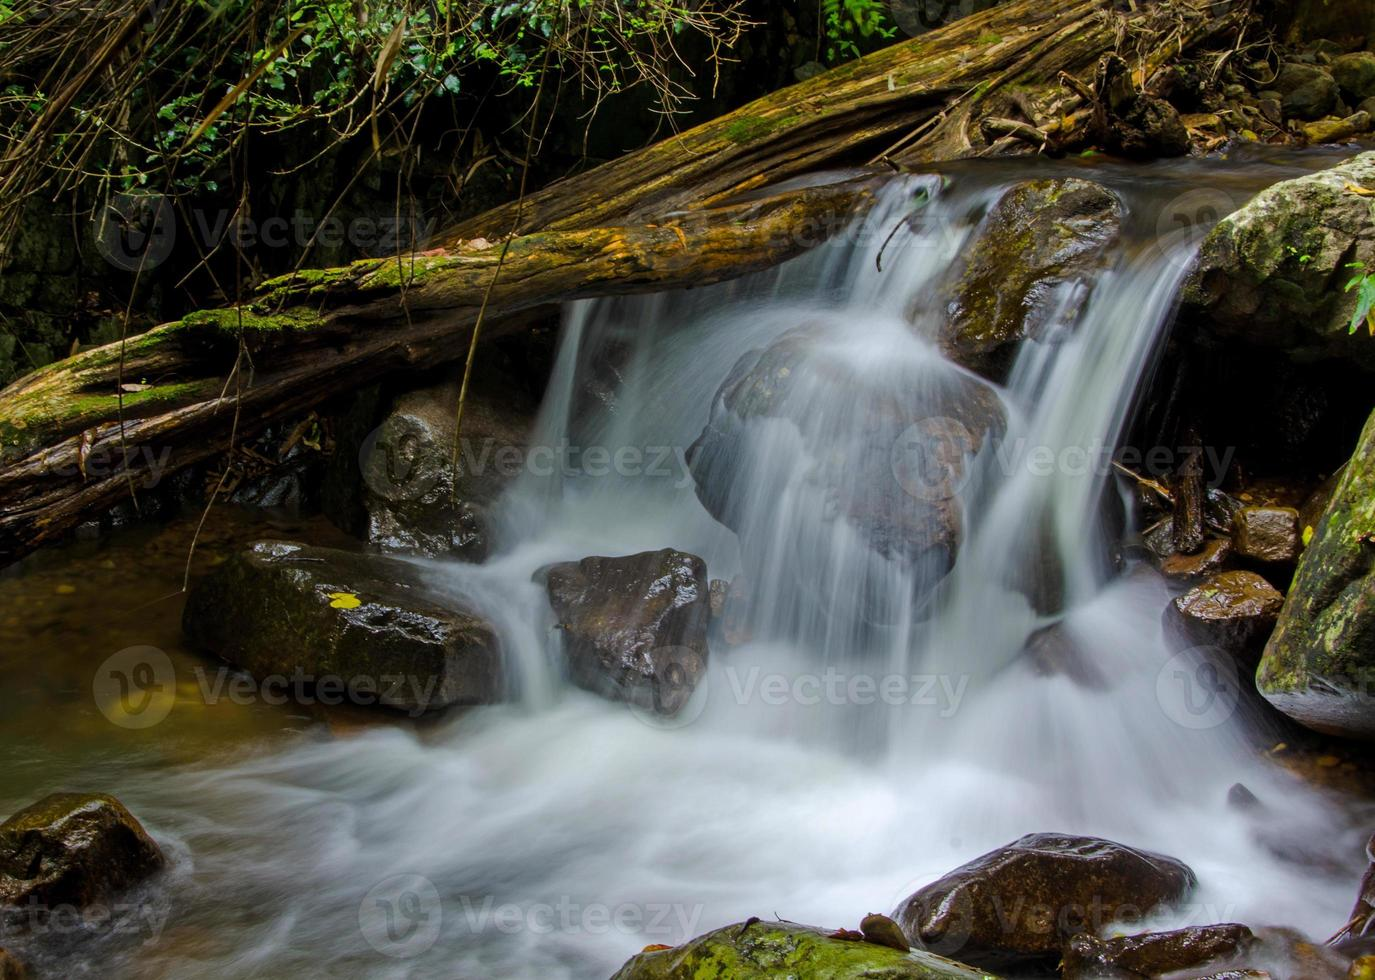 vattenfall i djup regnskogsjungel foto